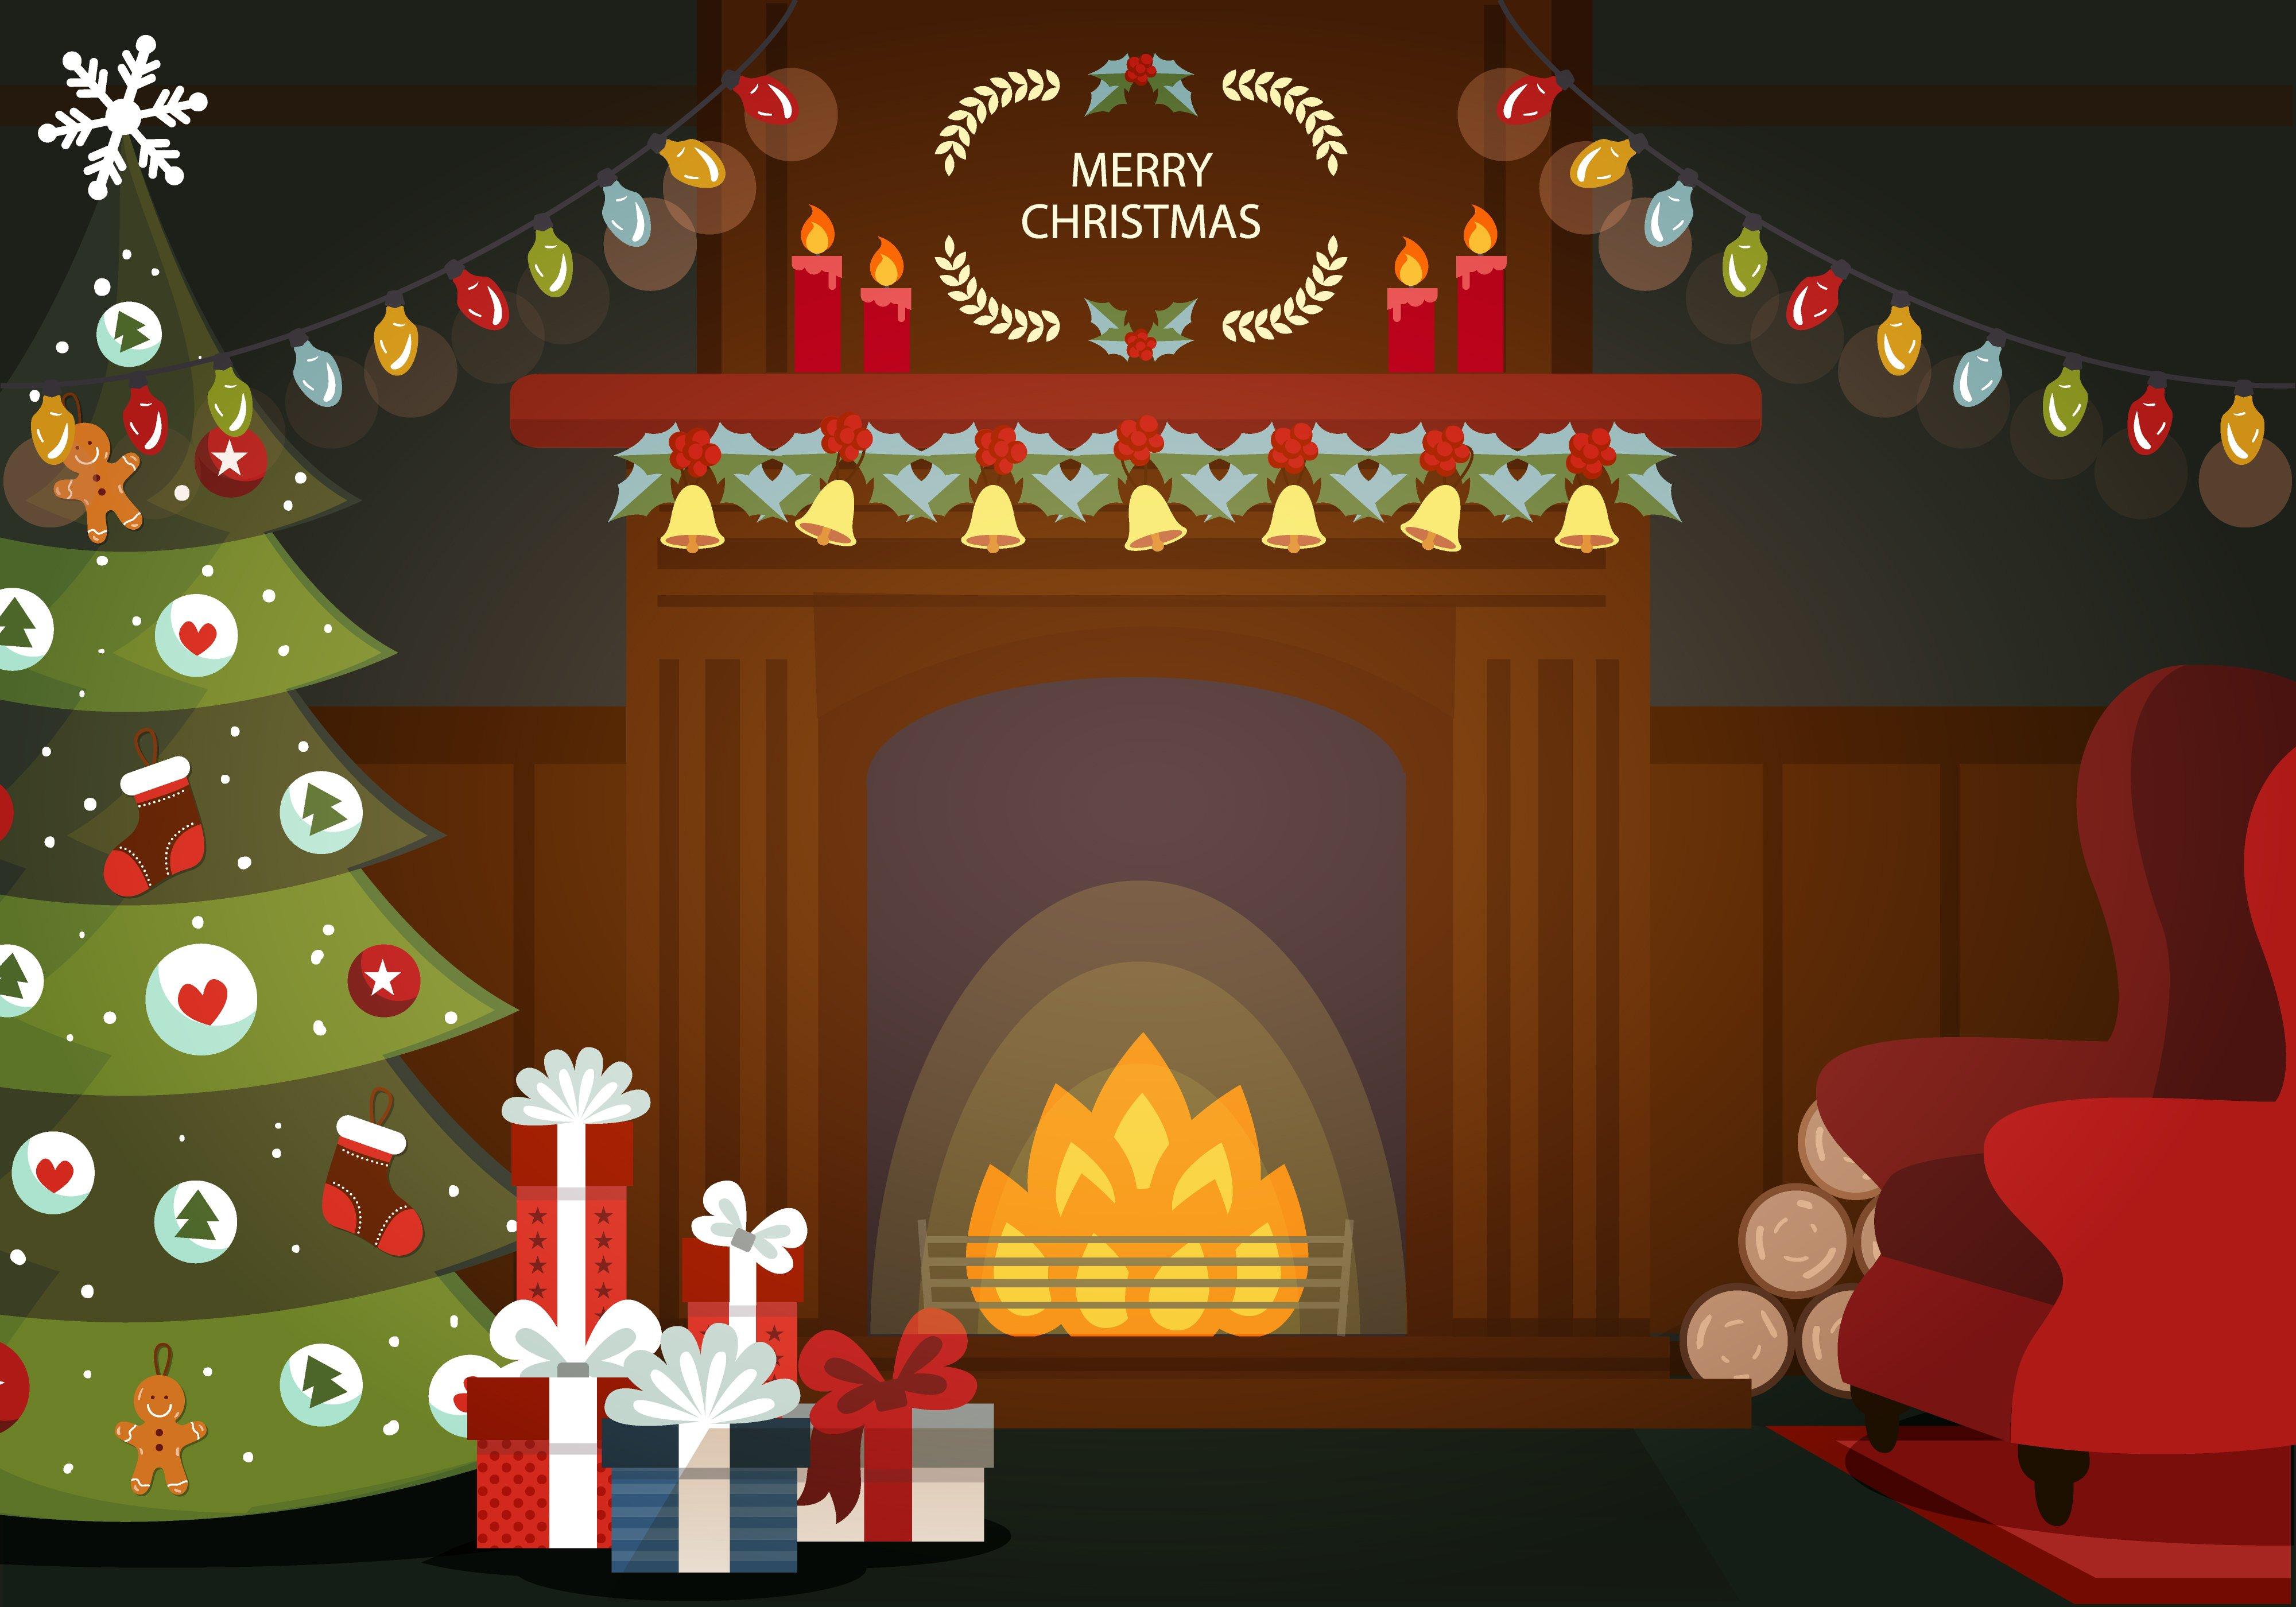 Christmas Fireplace Cartoon Family – Wonderful Image Gallery